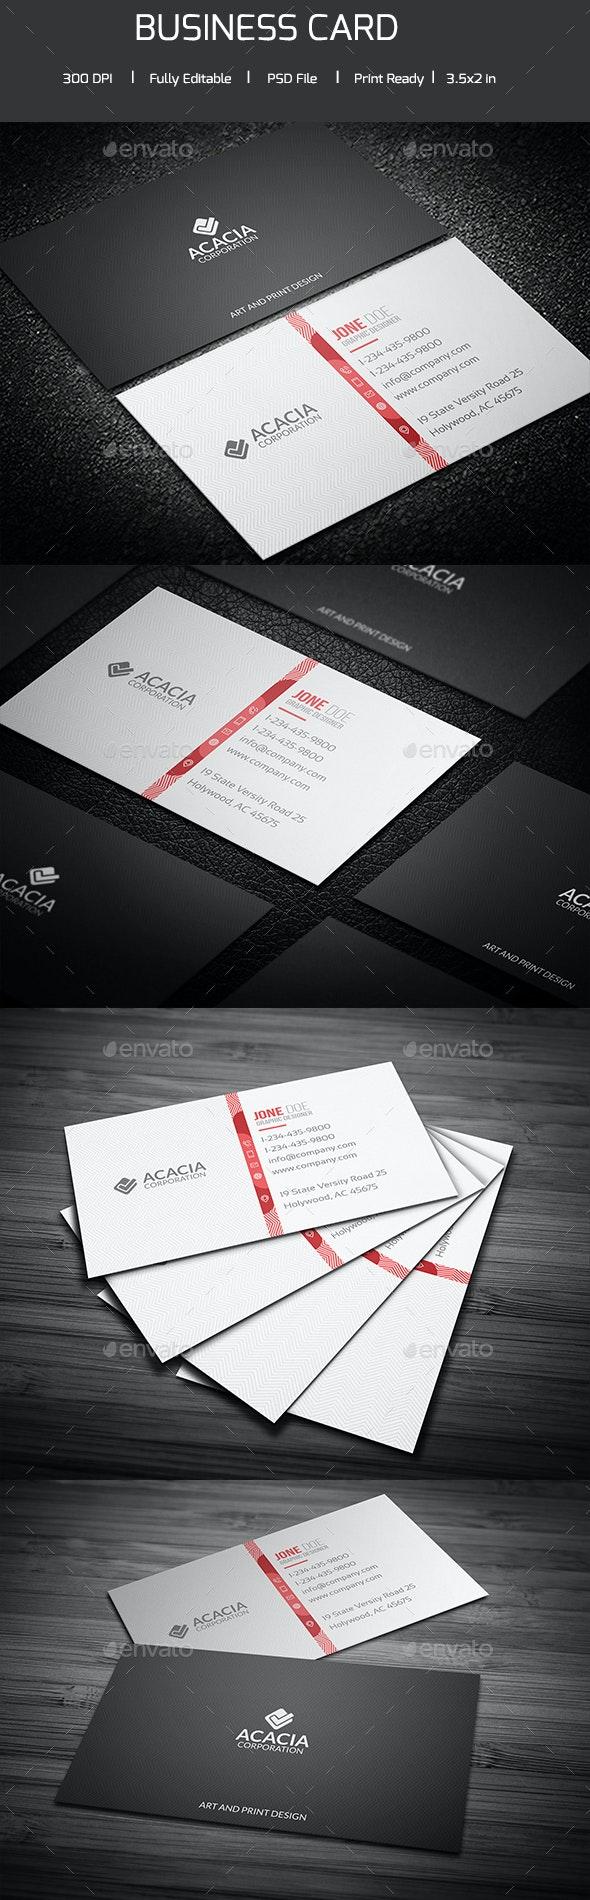 Brazoya Business Card - Corporate Business Cards